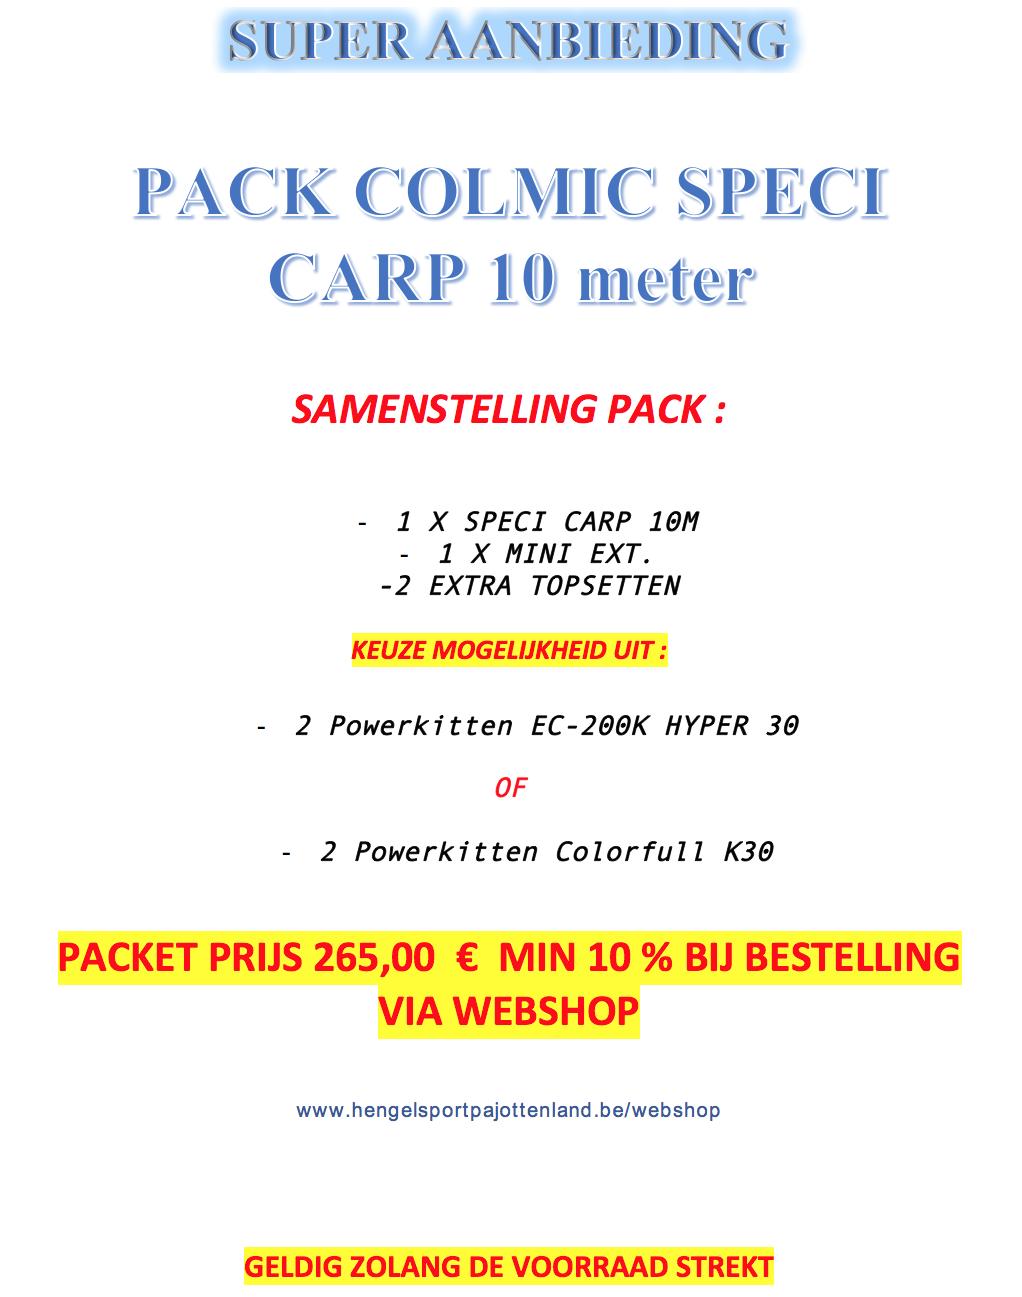 PACK COLMIC SPECIE CARP 10M